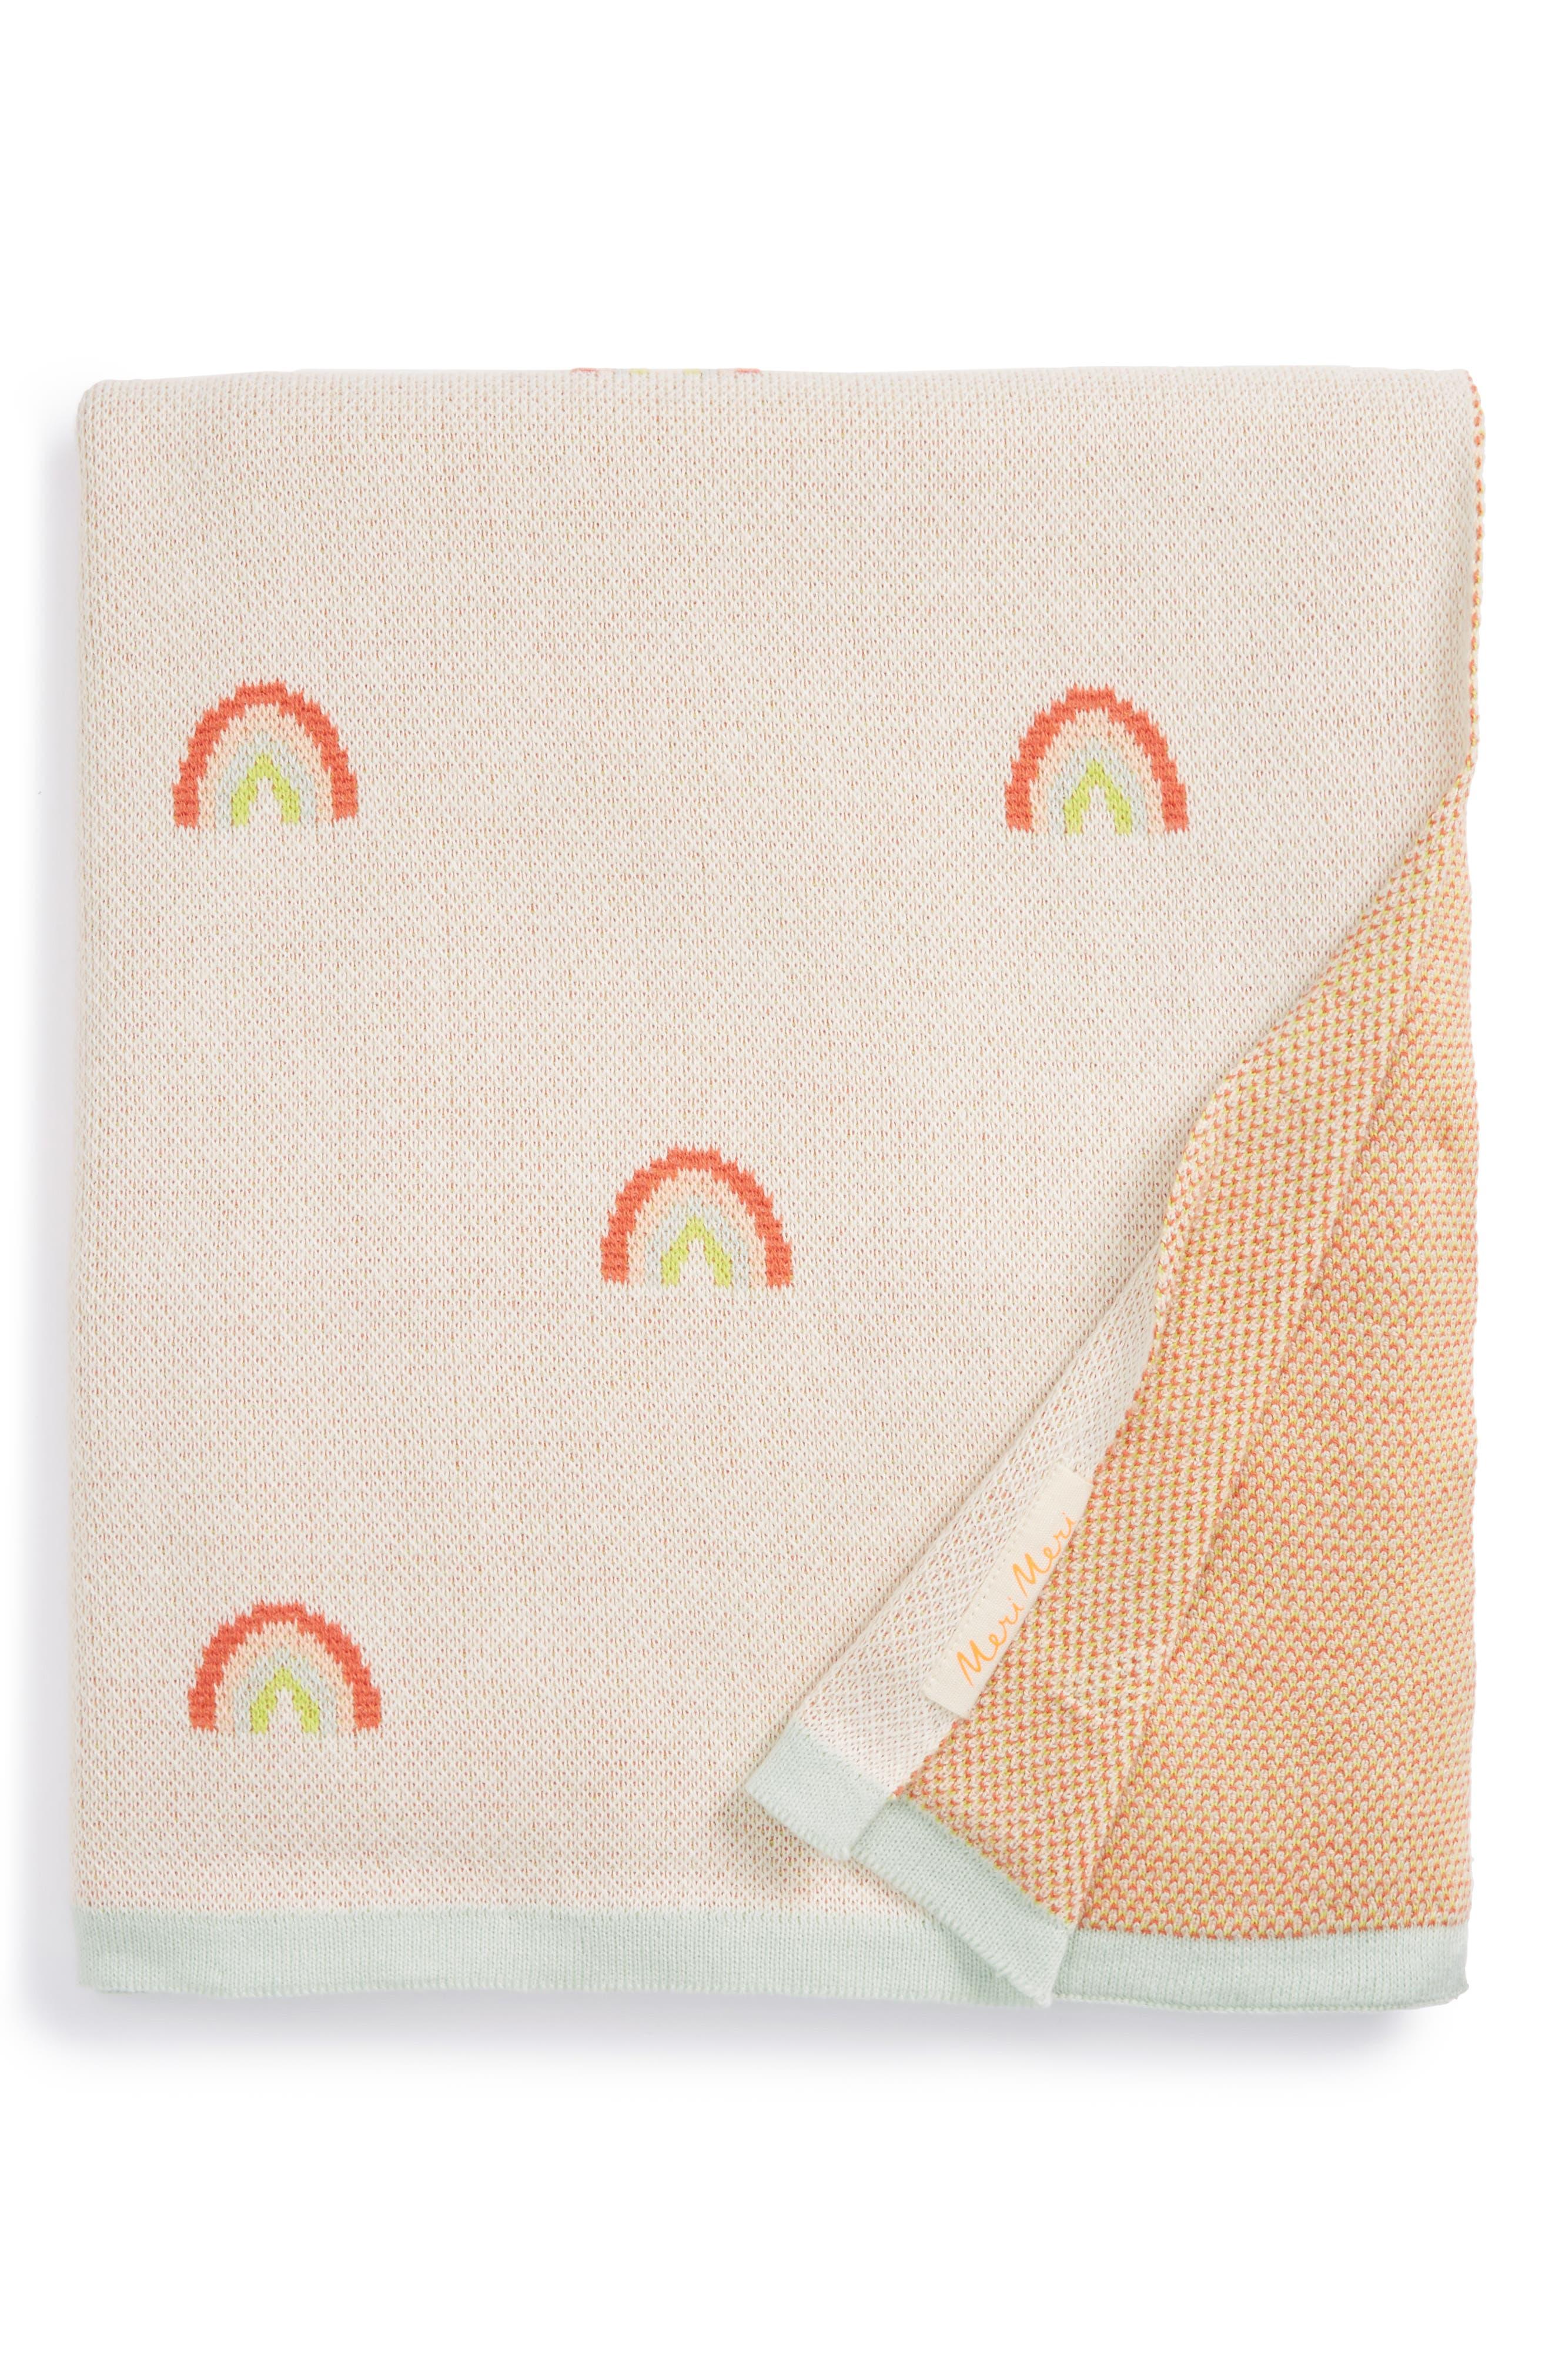 Main Image - Meri Meri Rainbow Organic Cotton Intarsia Knit Blanket